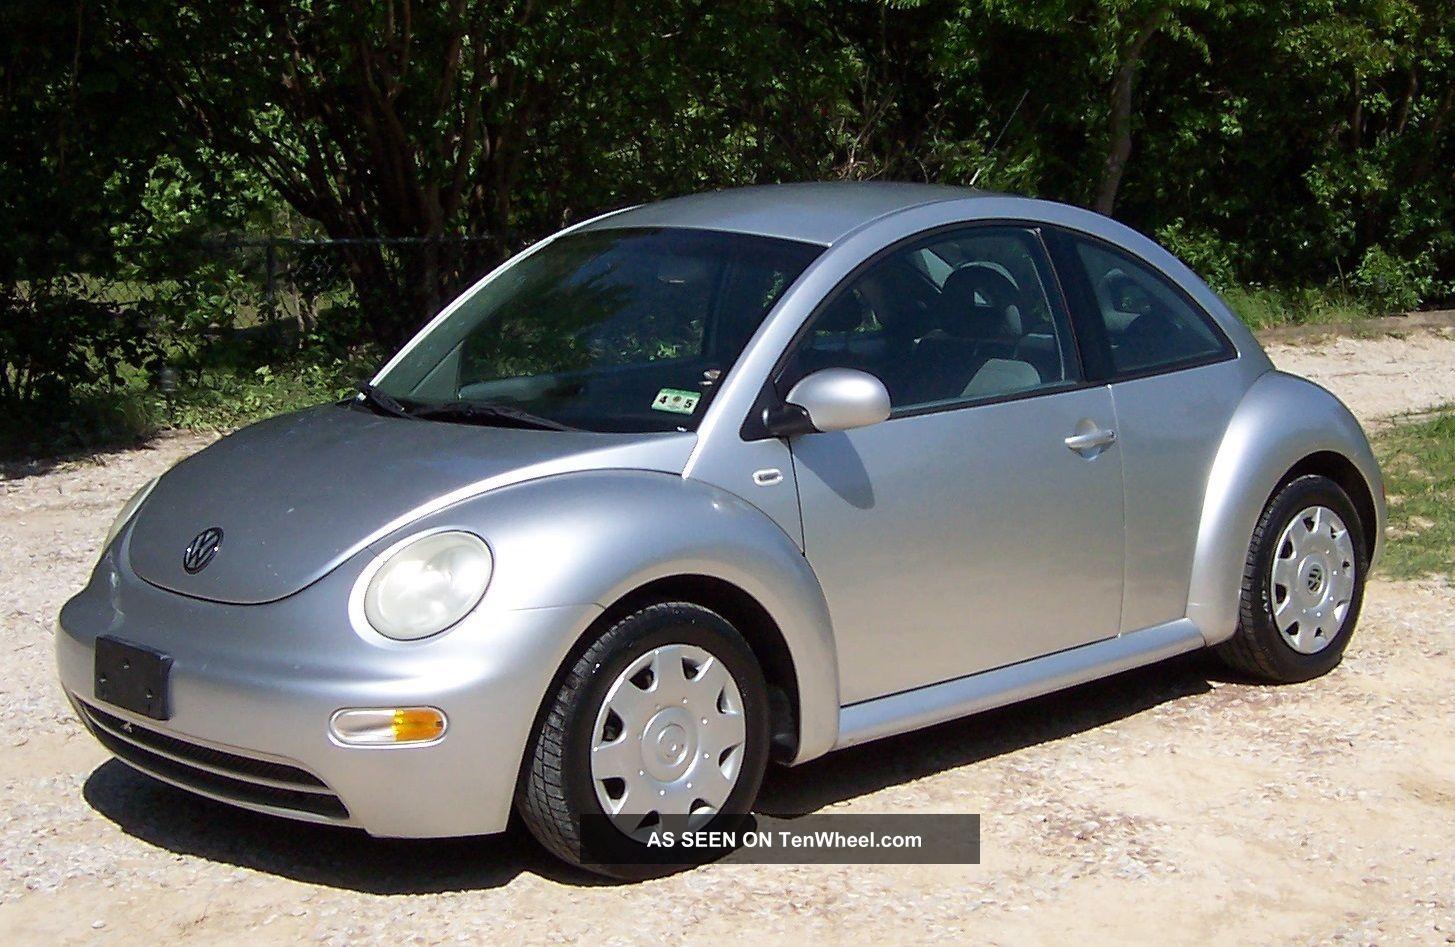 2001 volkswagen beetle gls 5 speed manual ice cold air. Black Bedroom Furniture Sets. Home Design Ideas